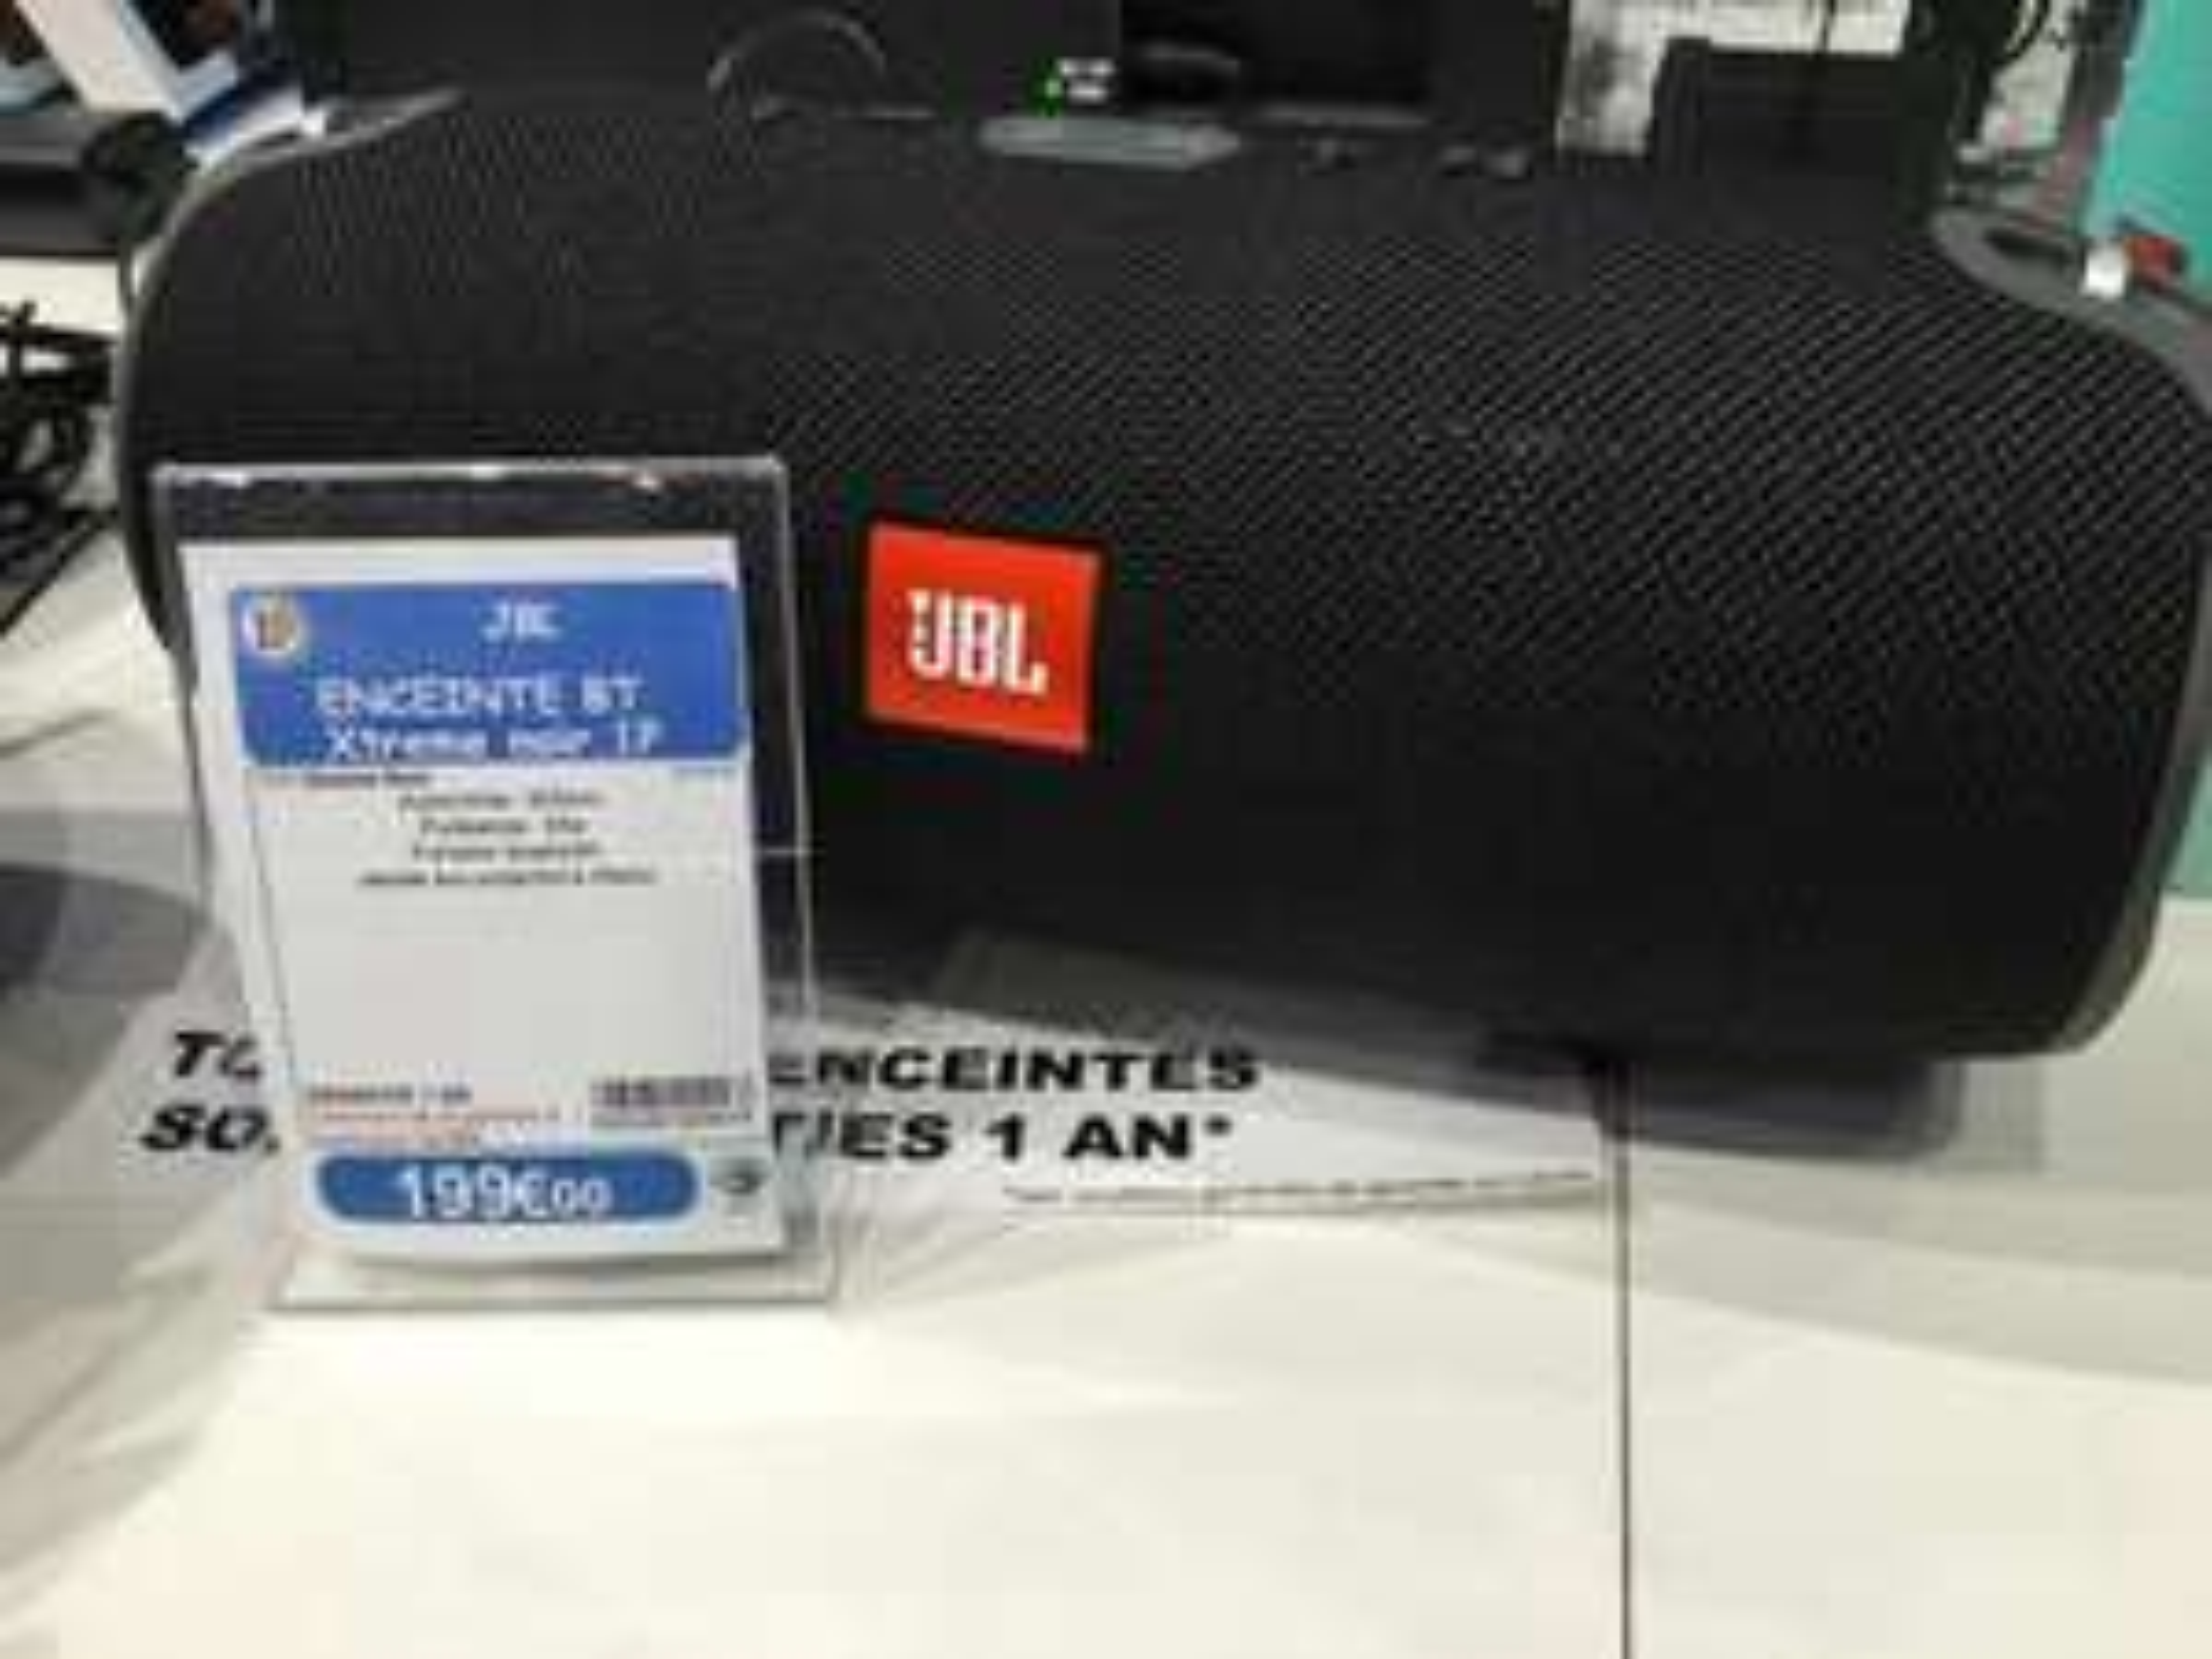 Enceinte portable bluetooth JBL Xtreme Noire